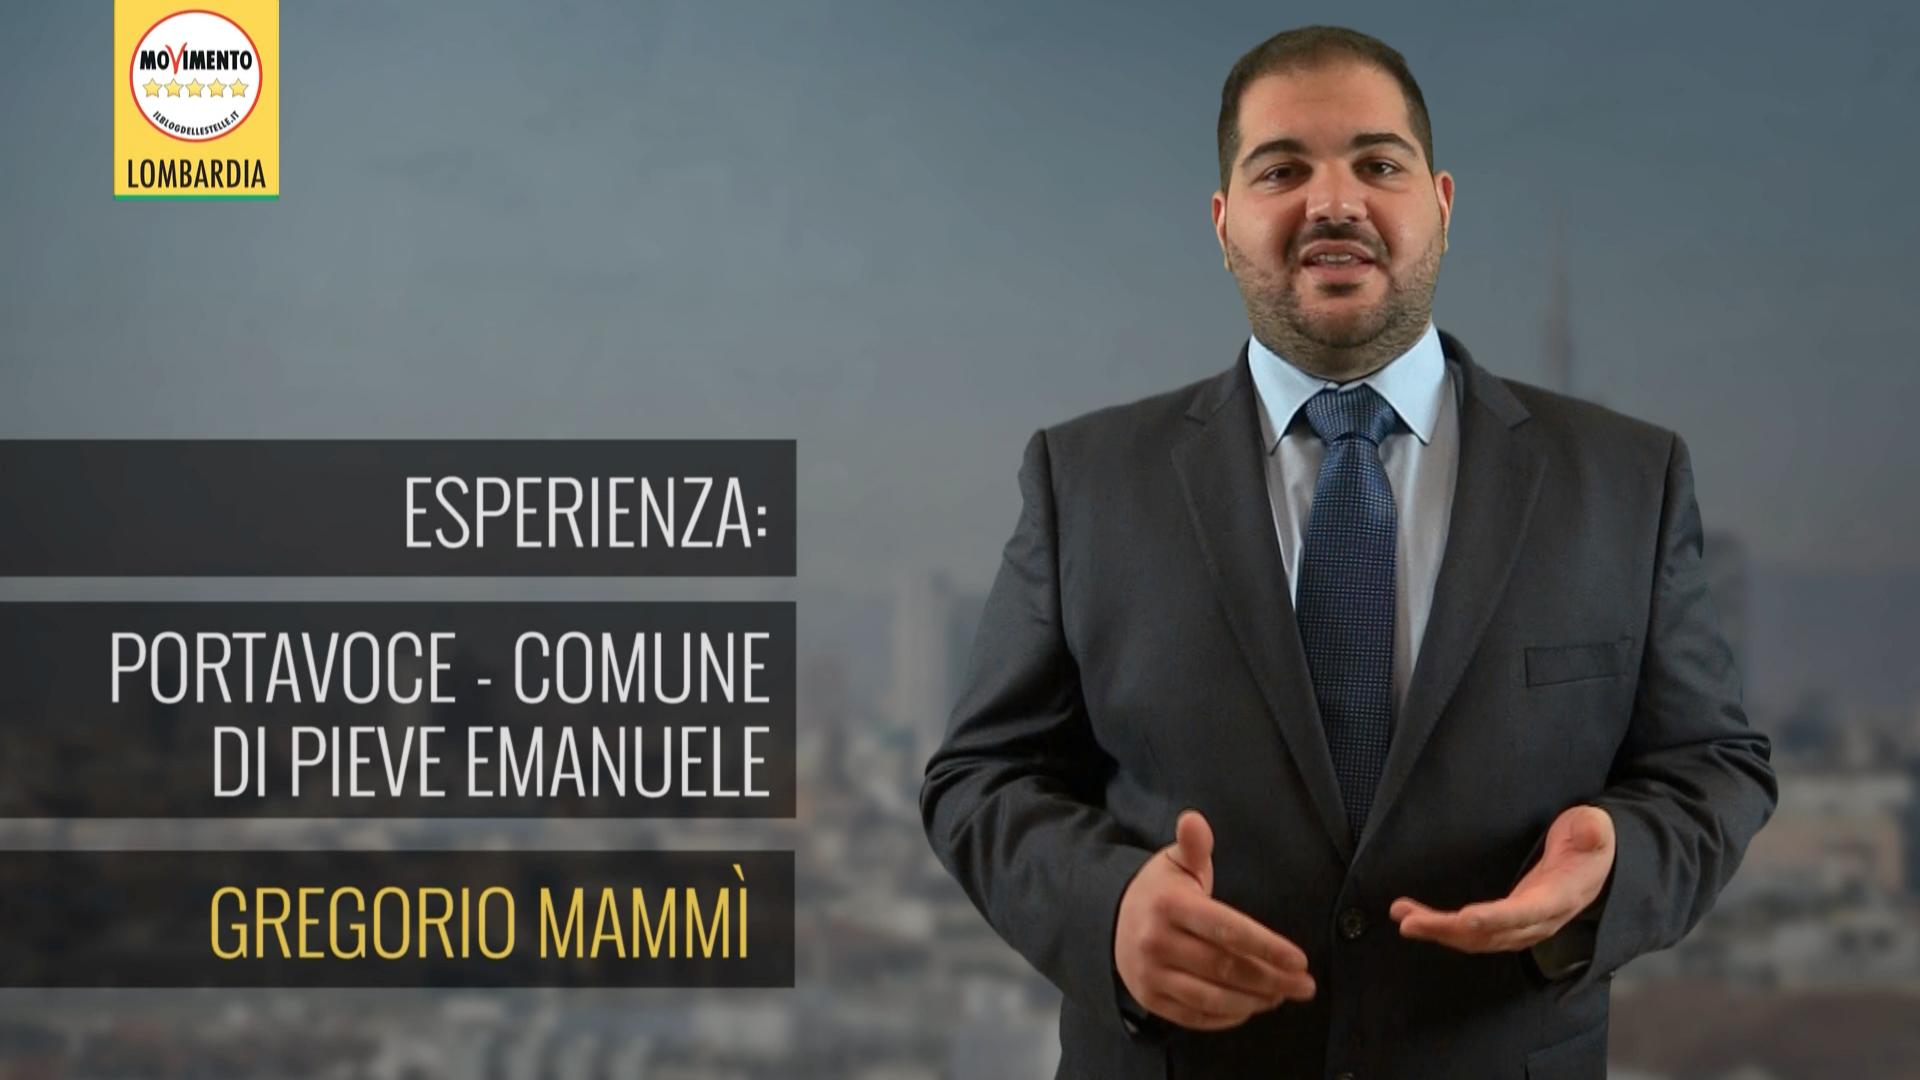 Conosciamo i consiglieri regionali: Gregorio Mammì